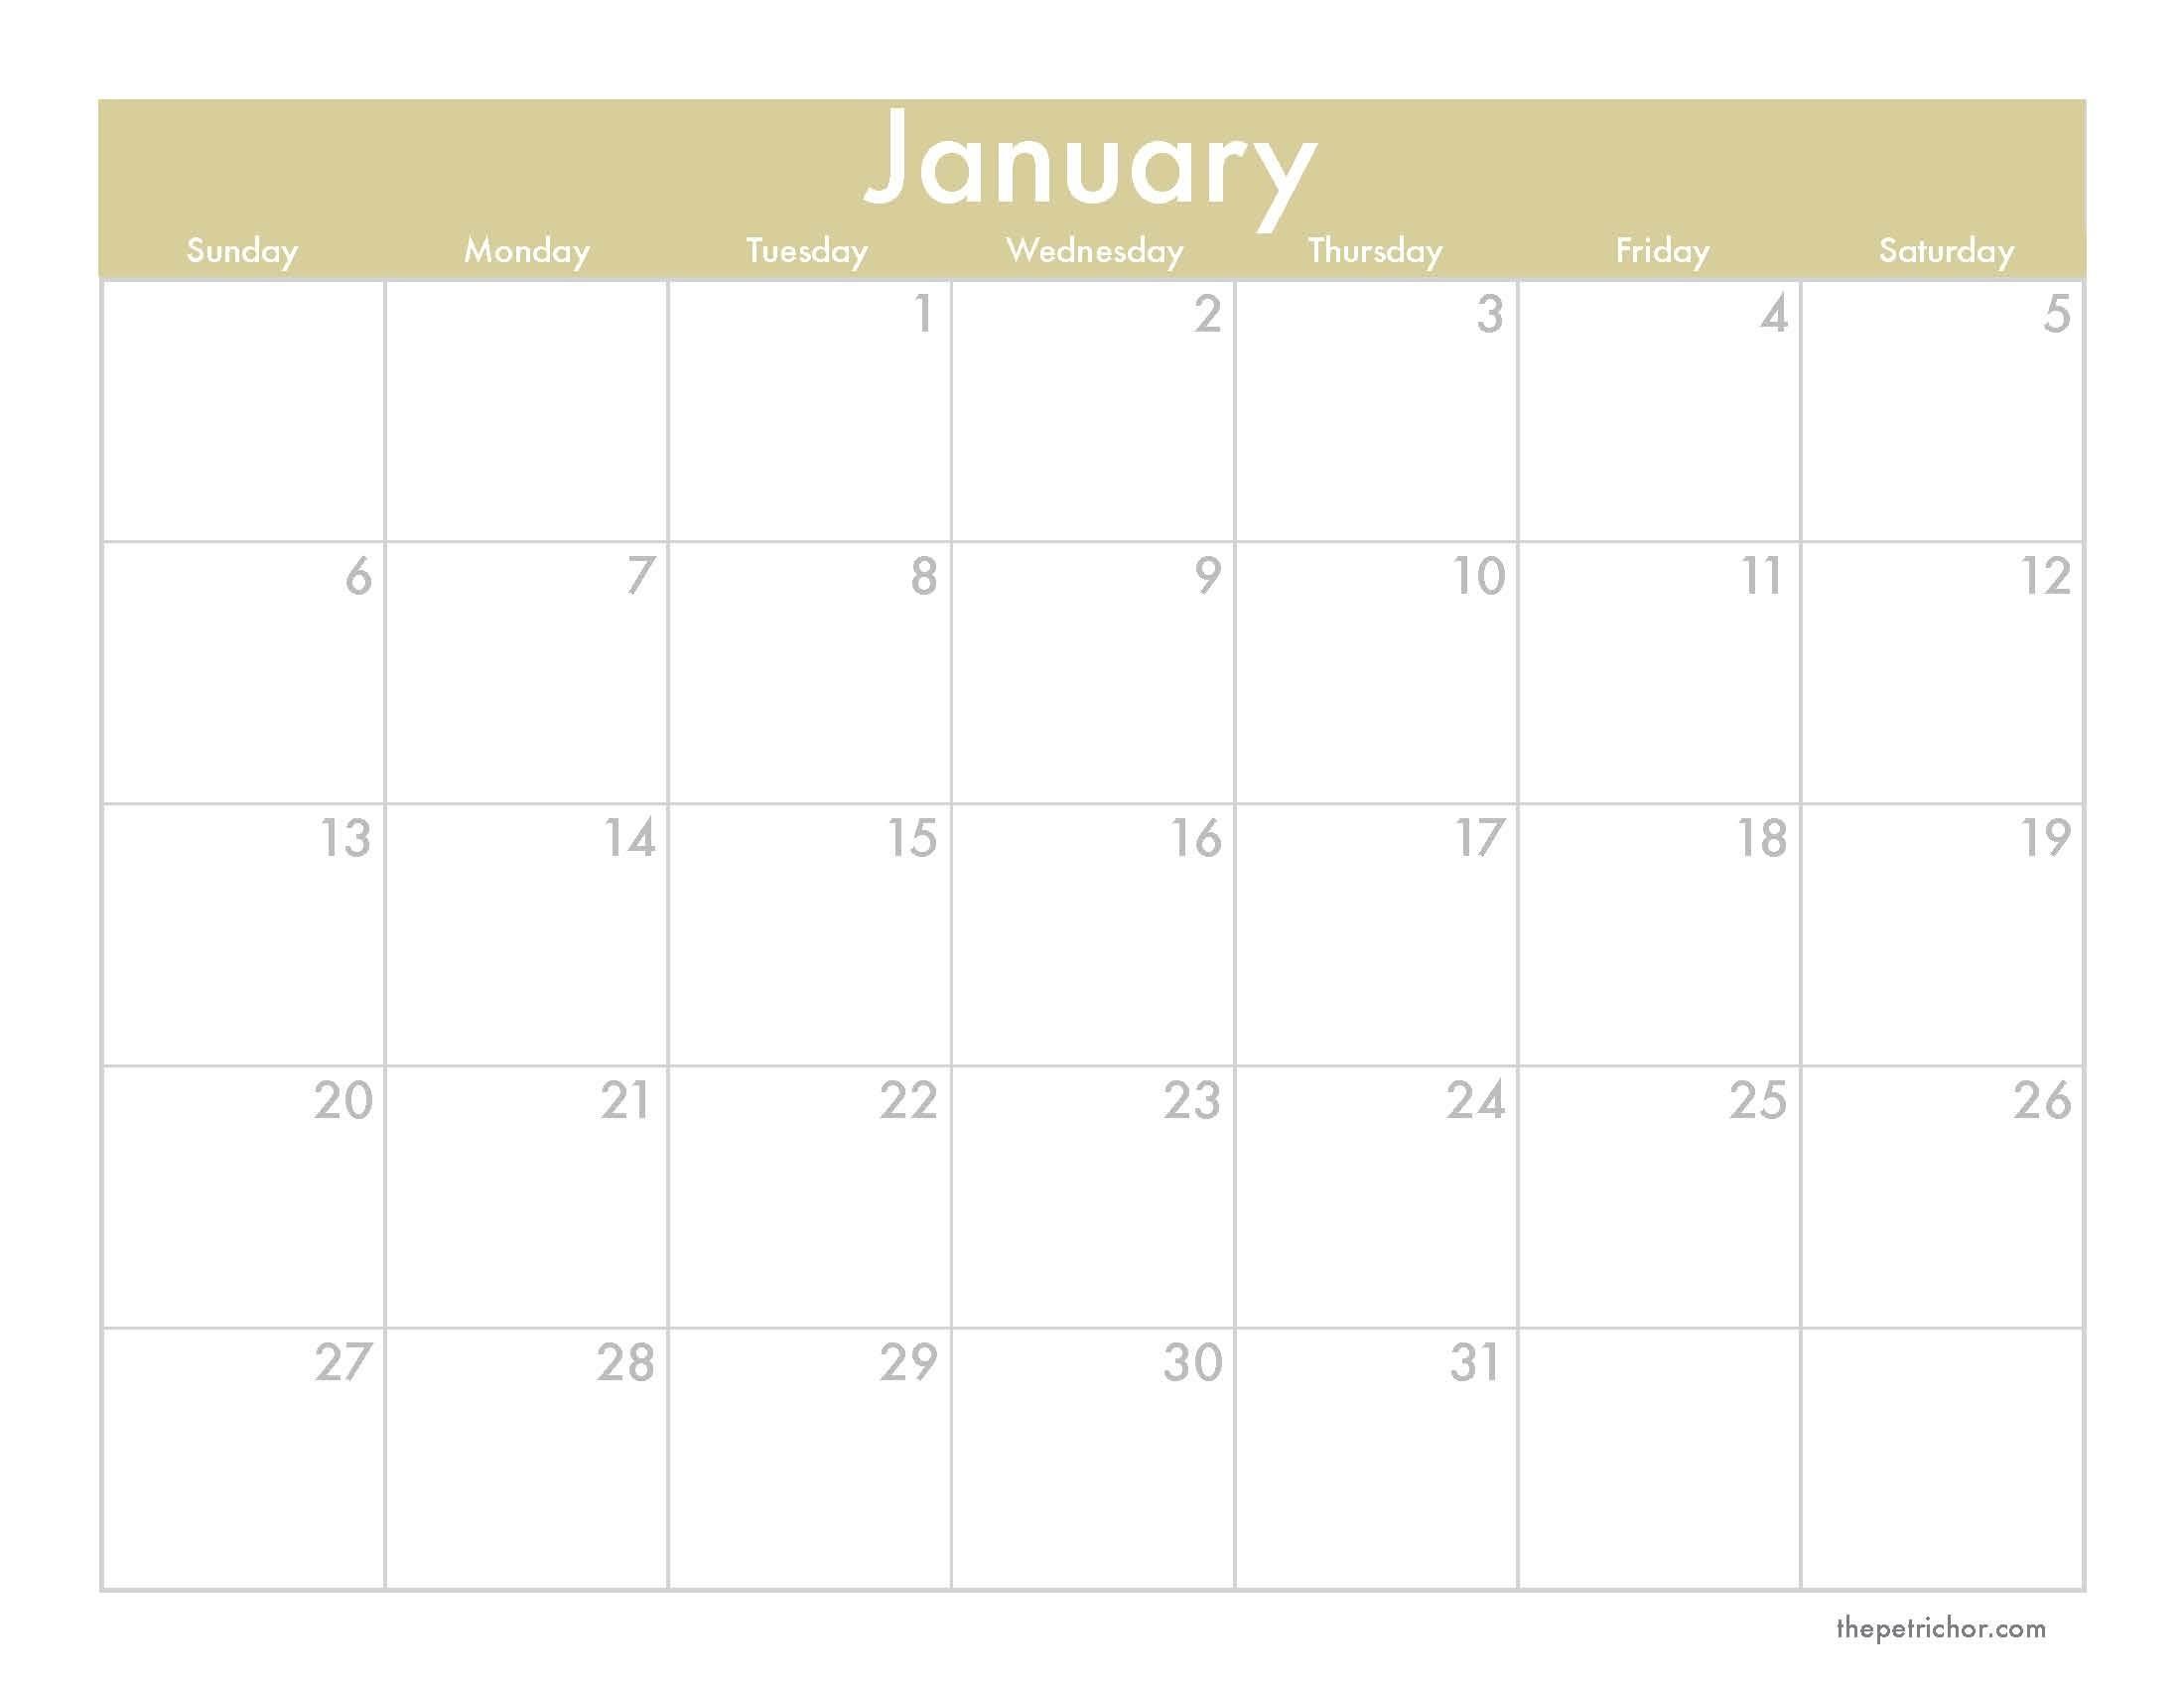 march 2018 calendar kalnirnay mas actual microsoft fice calendar template 2018 monthly calendar schedule of march 2018 calendar kalnirnay